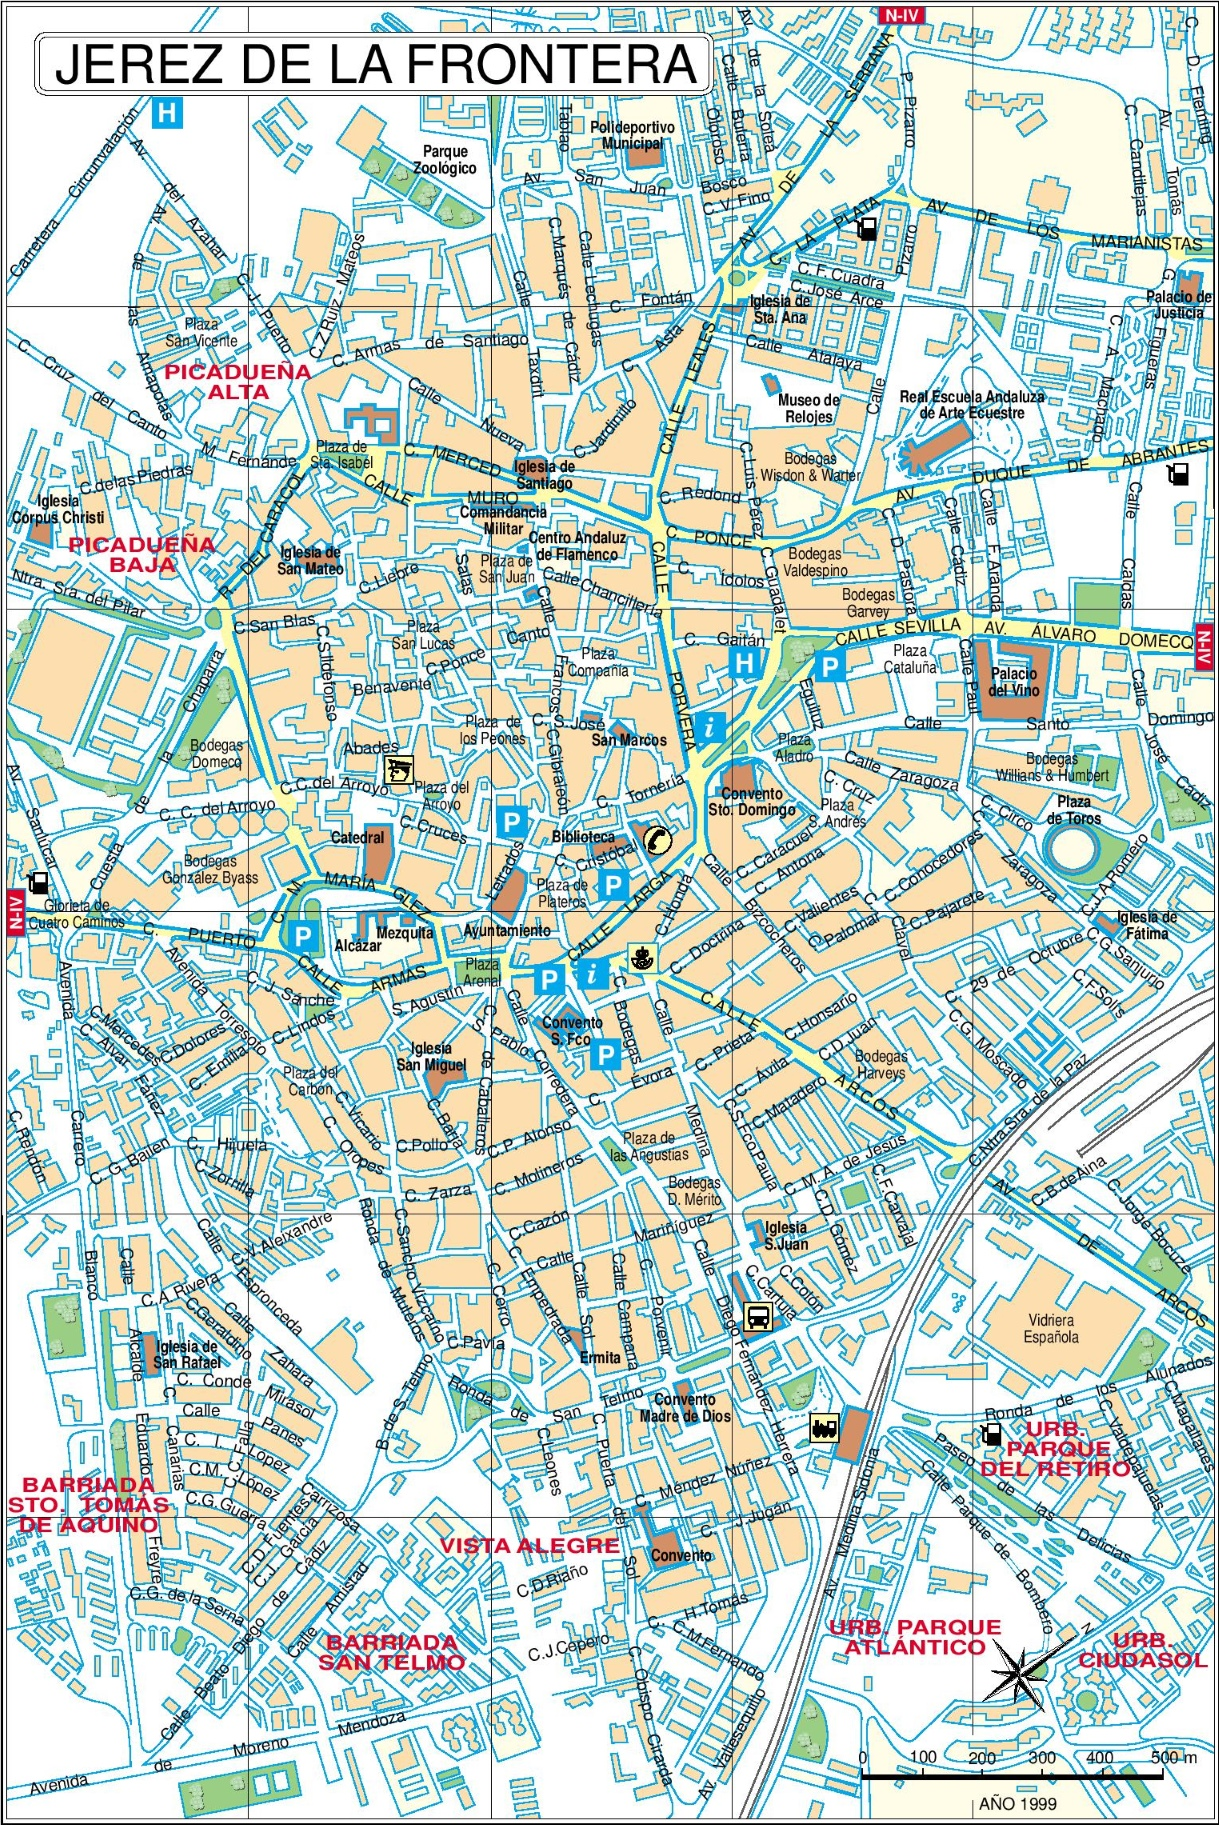 Jerez de la frontera city center map for Azulejos jerez de la frontera